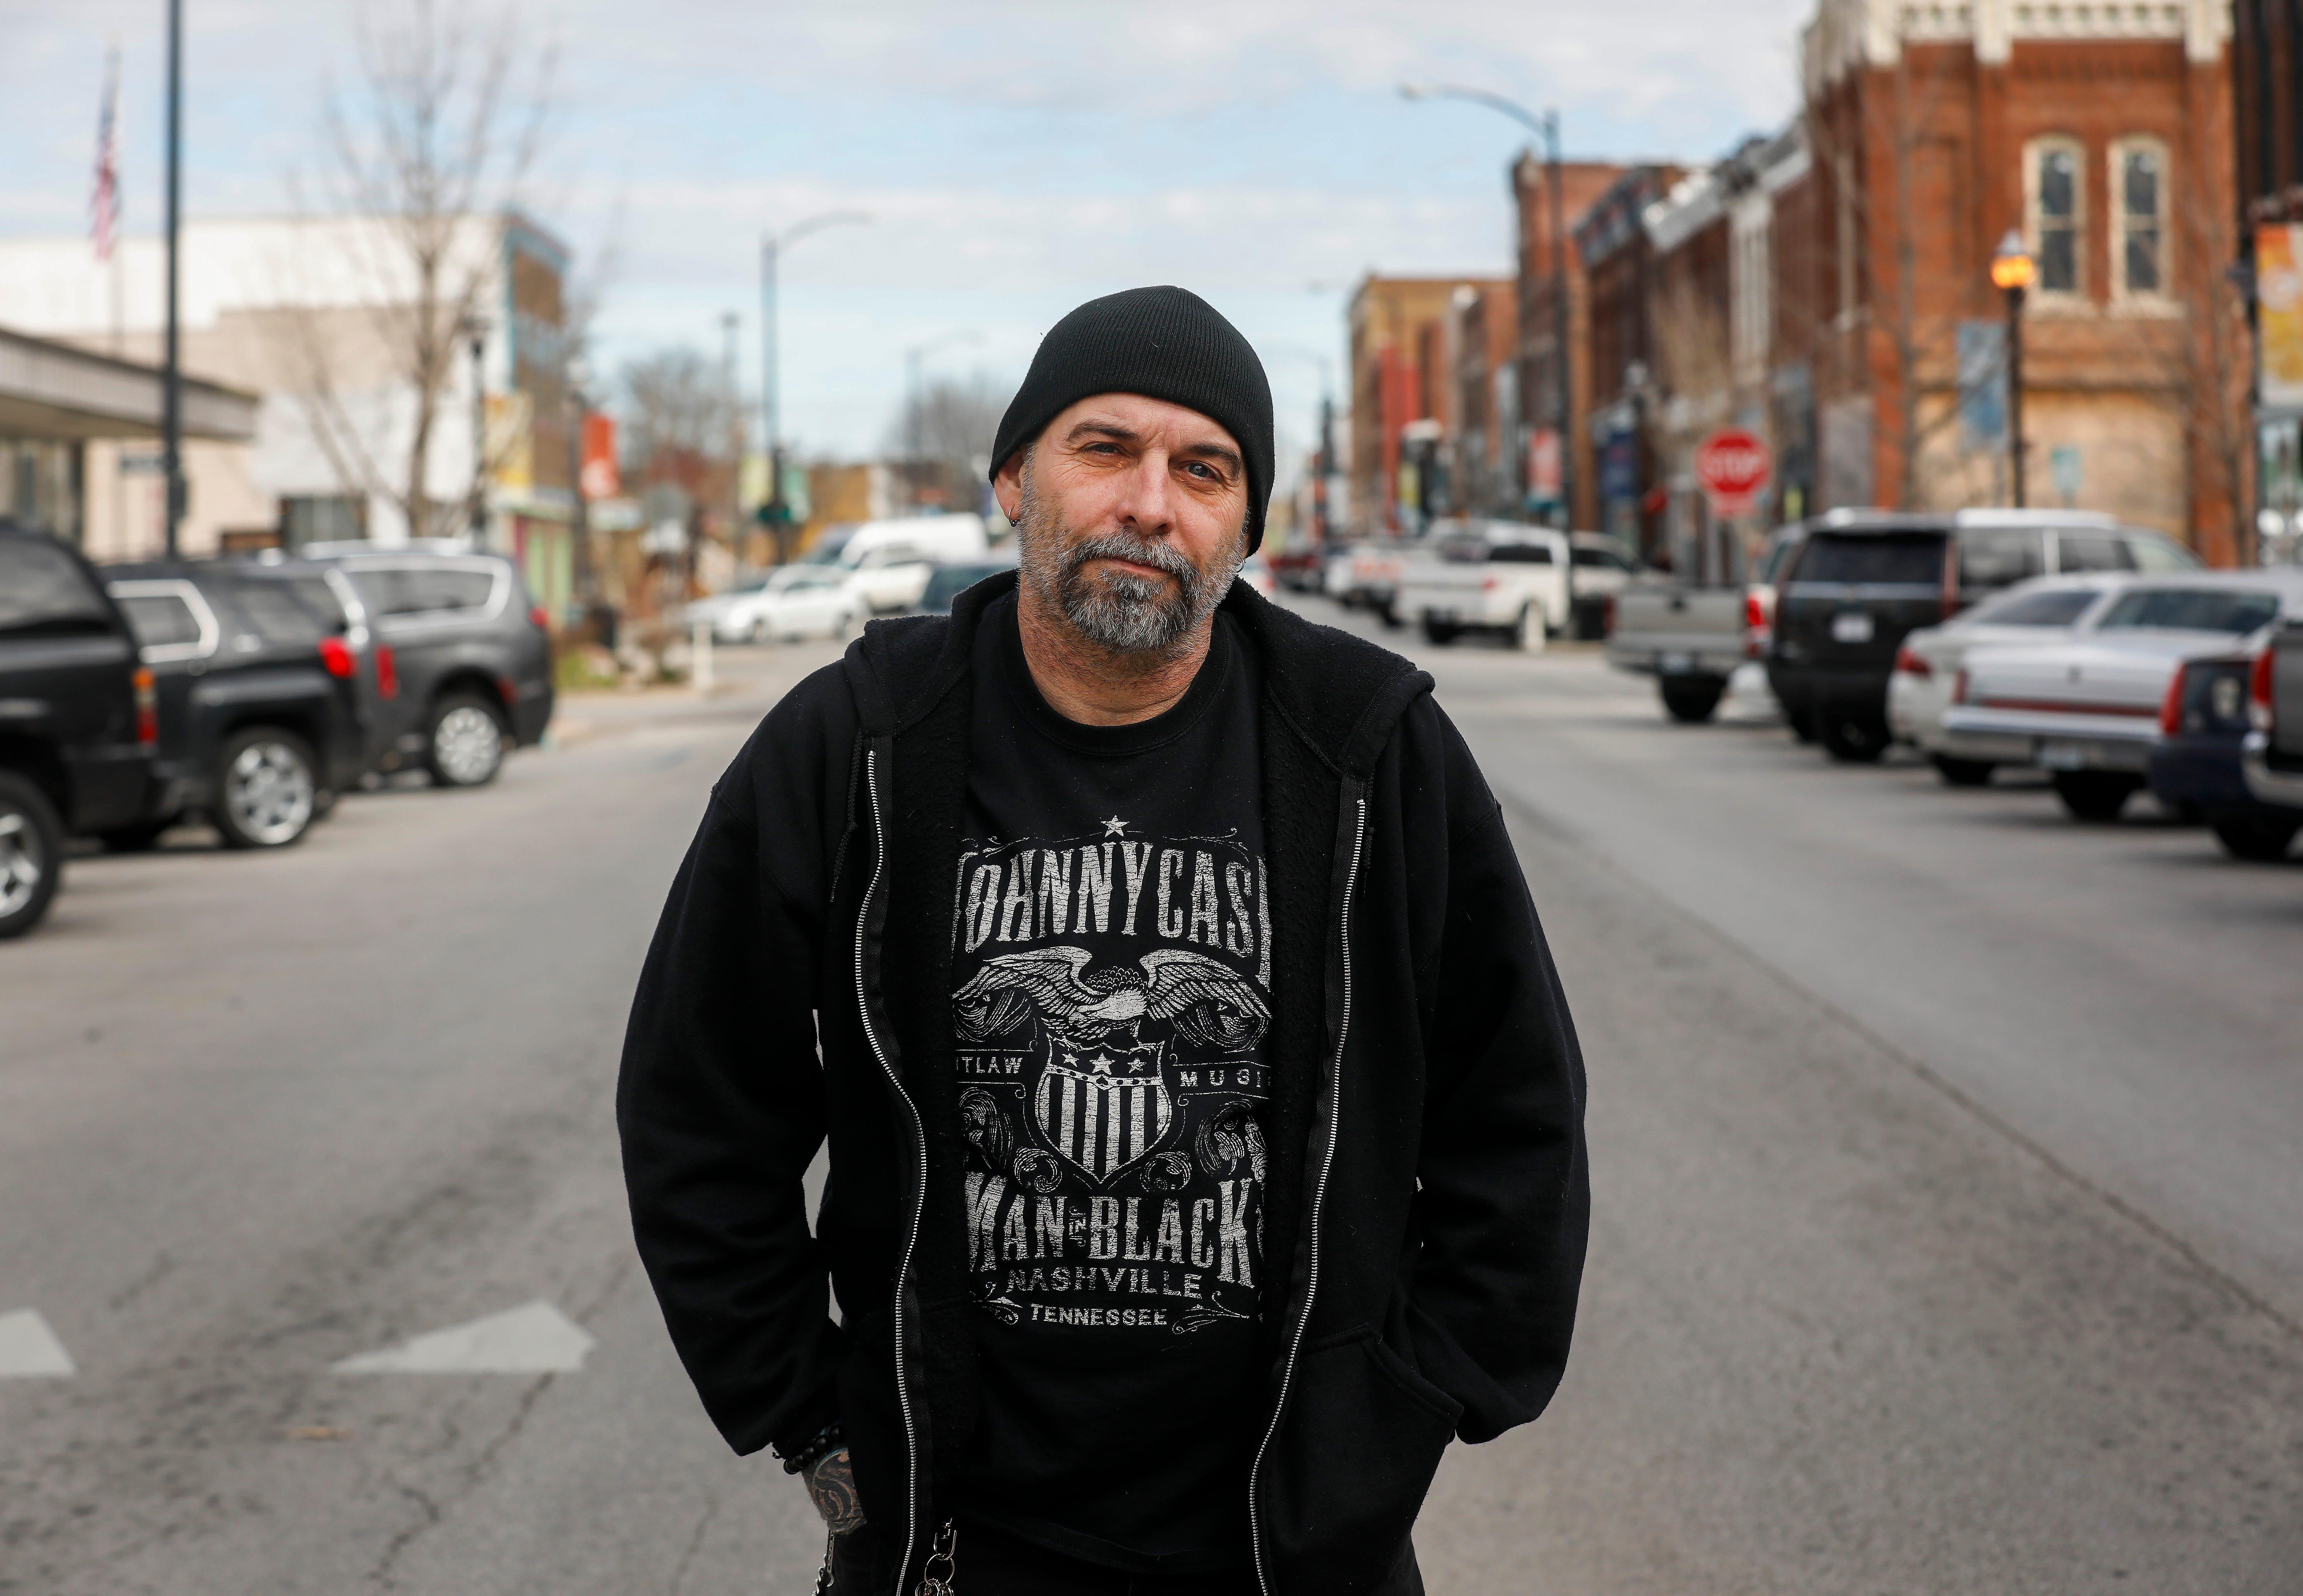 Joe Bridges organized the vigil for Hailey Owens on Commercial Street 5 years ago.